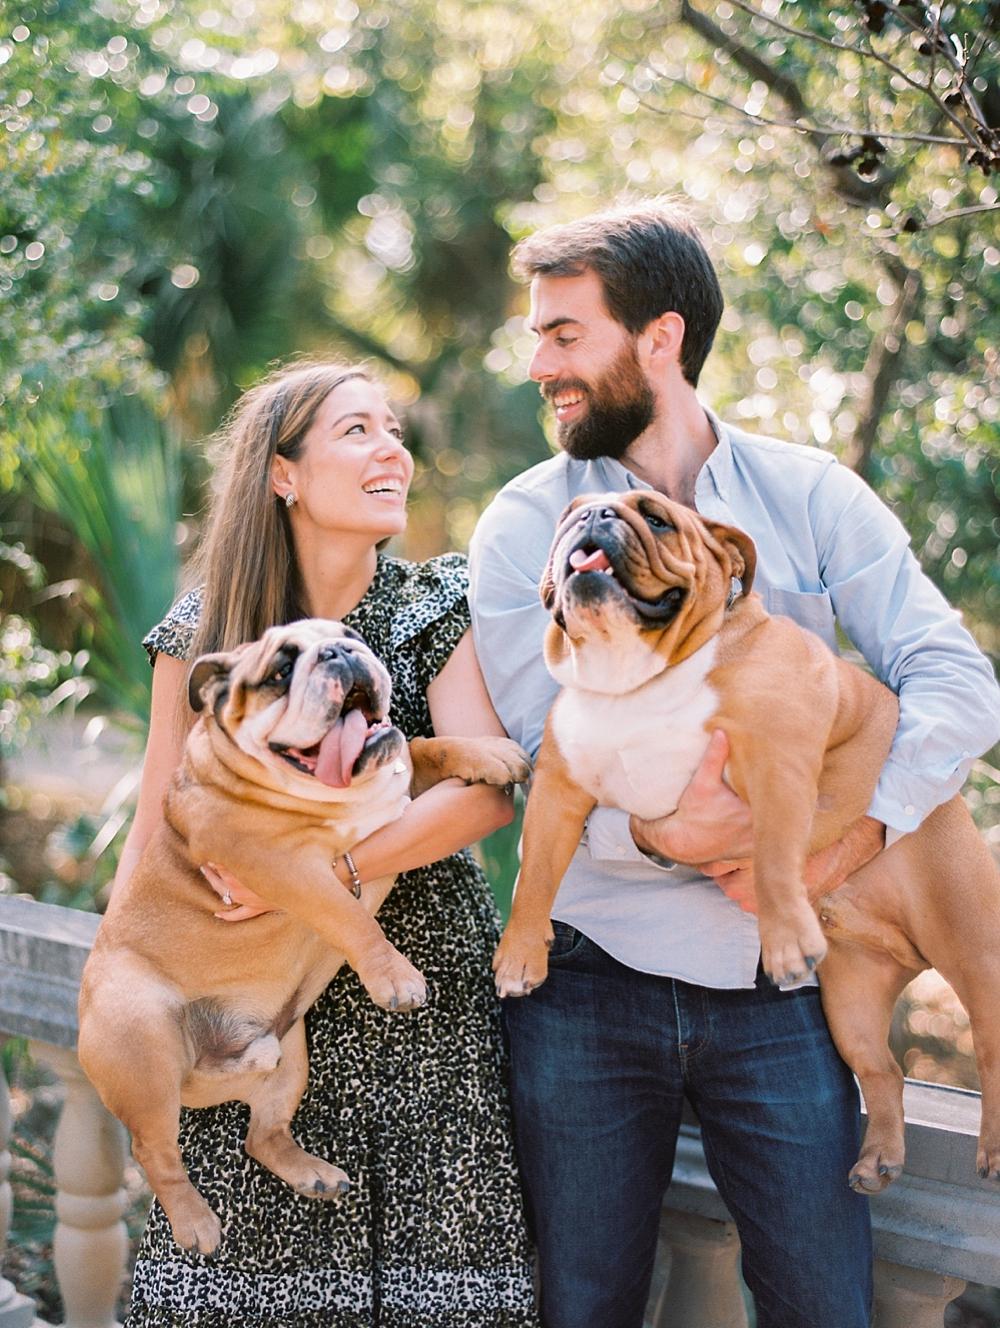 kristin-la-voie-photography-Austin-Wedding-Photographer-laguna-gloria-commodore-perry-estate-engagement-10